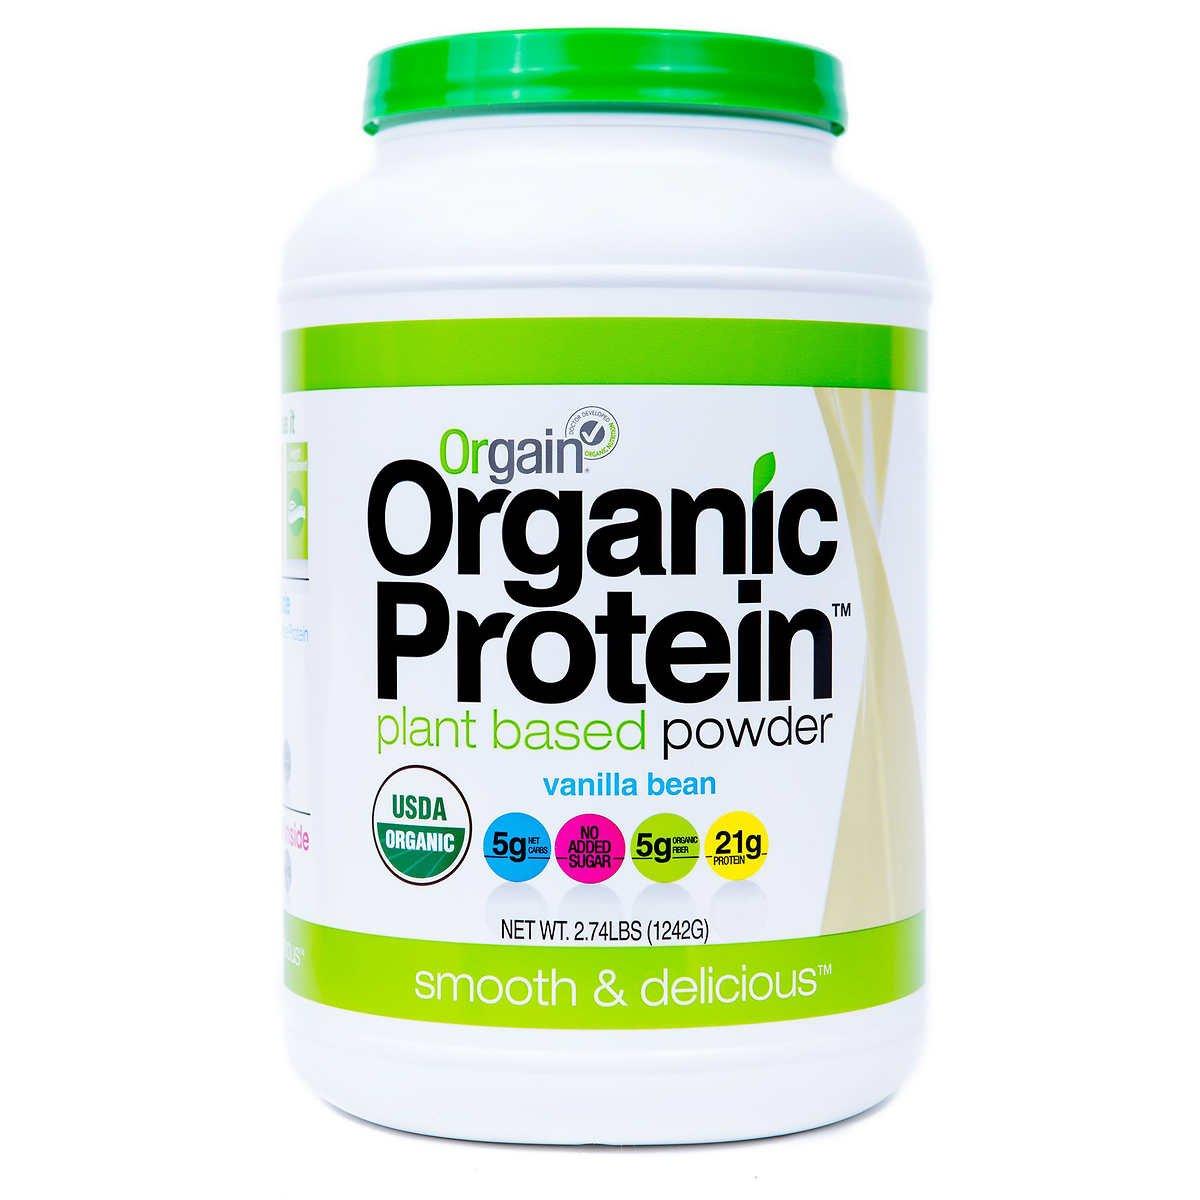 Orgain USDA Organic Plant Protein Powder, 2.74-pounds